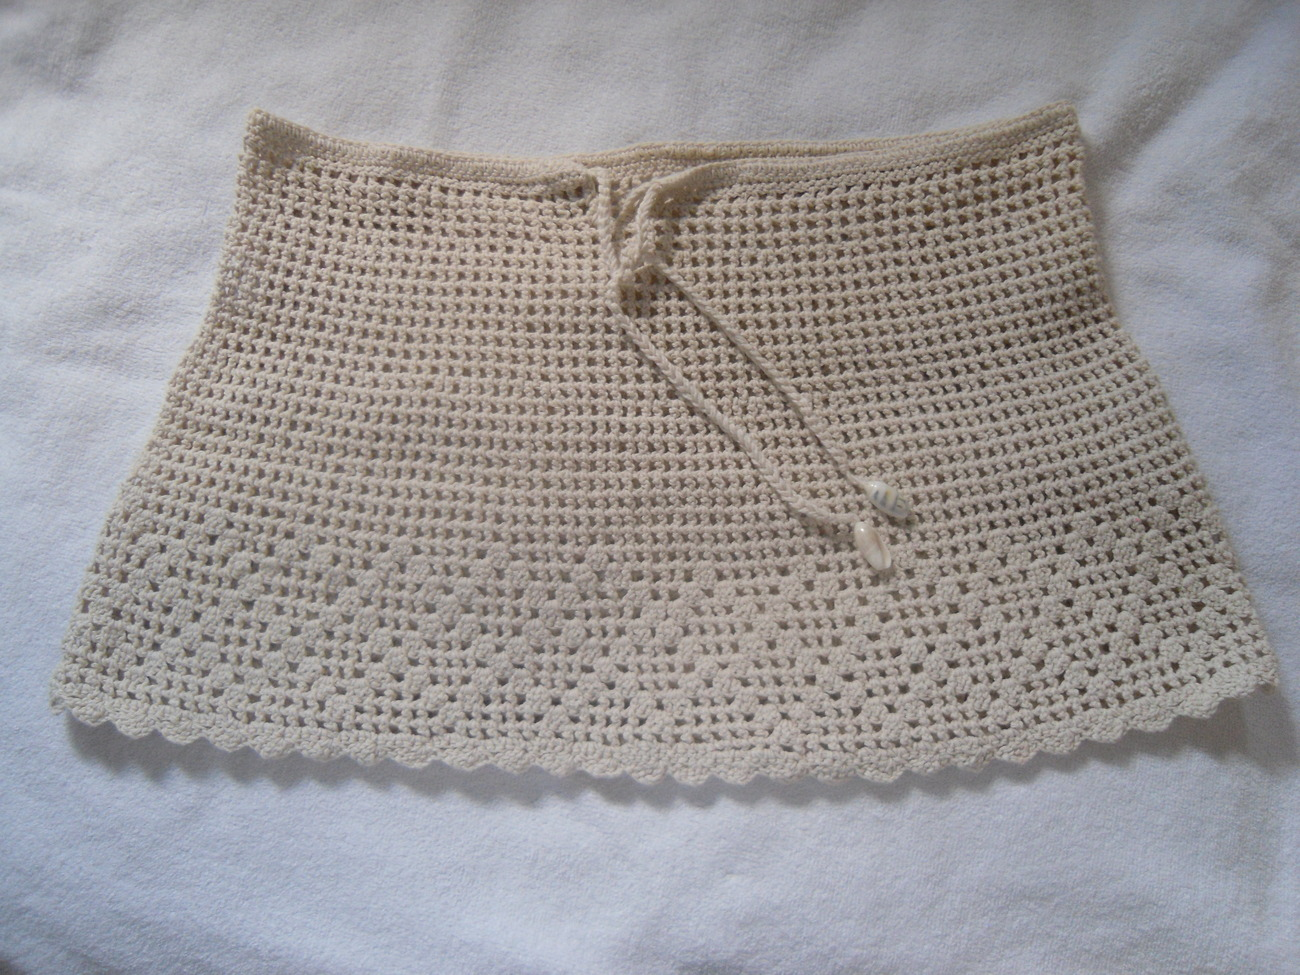 Crochet_beach_cover_up_skirt_front